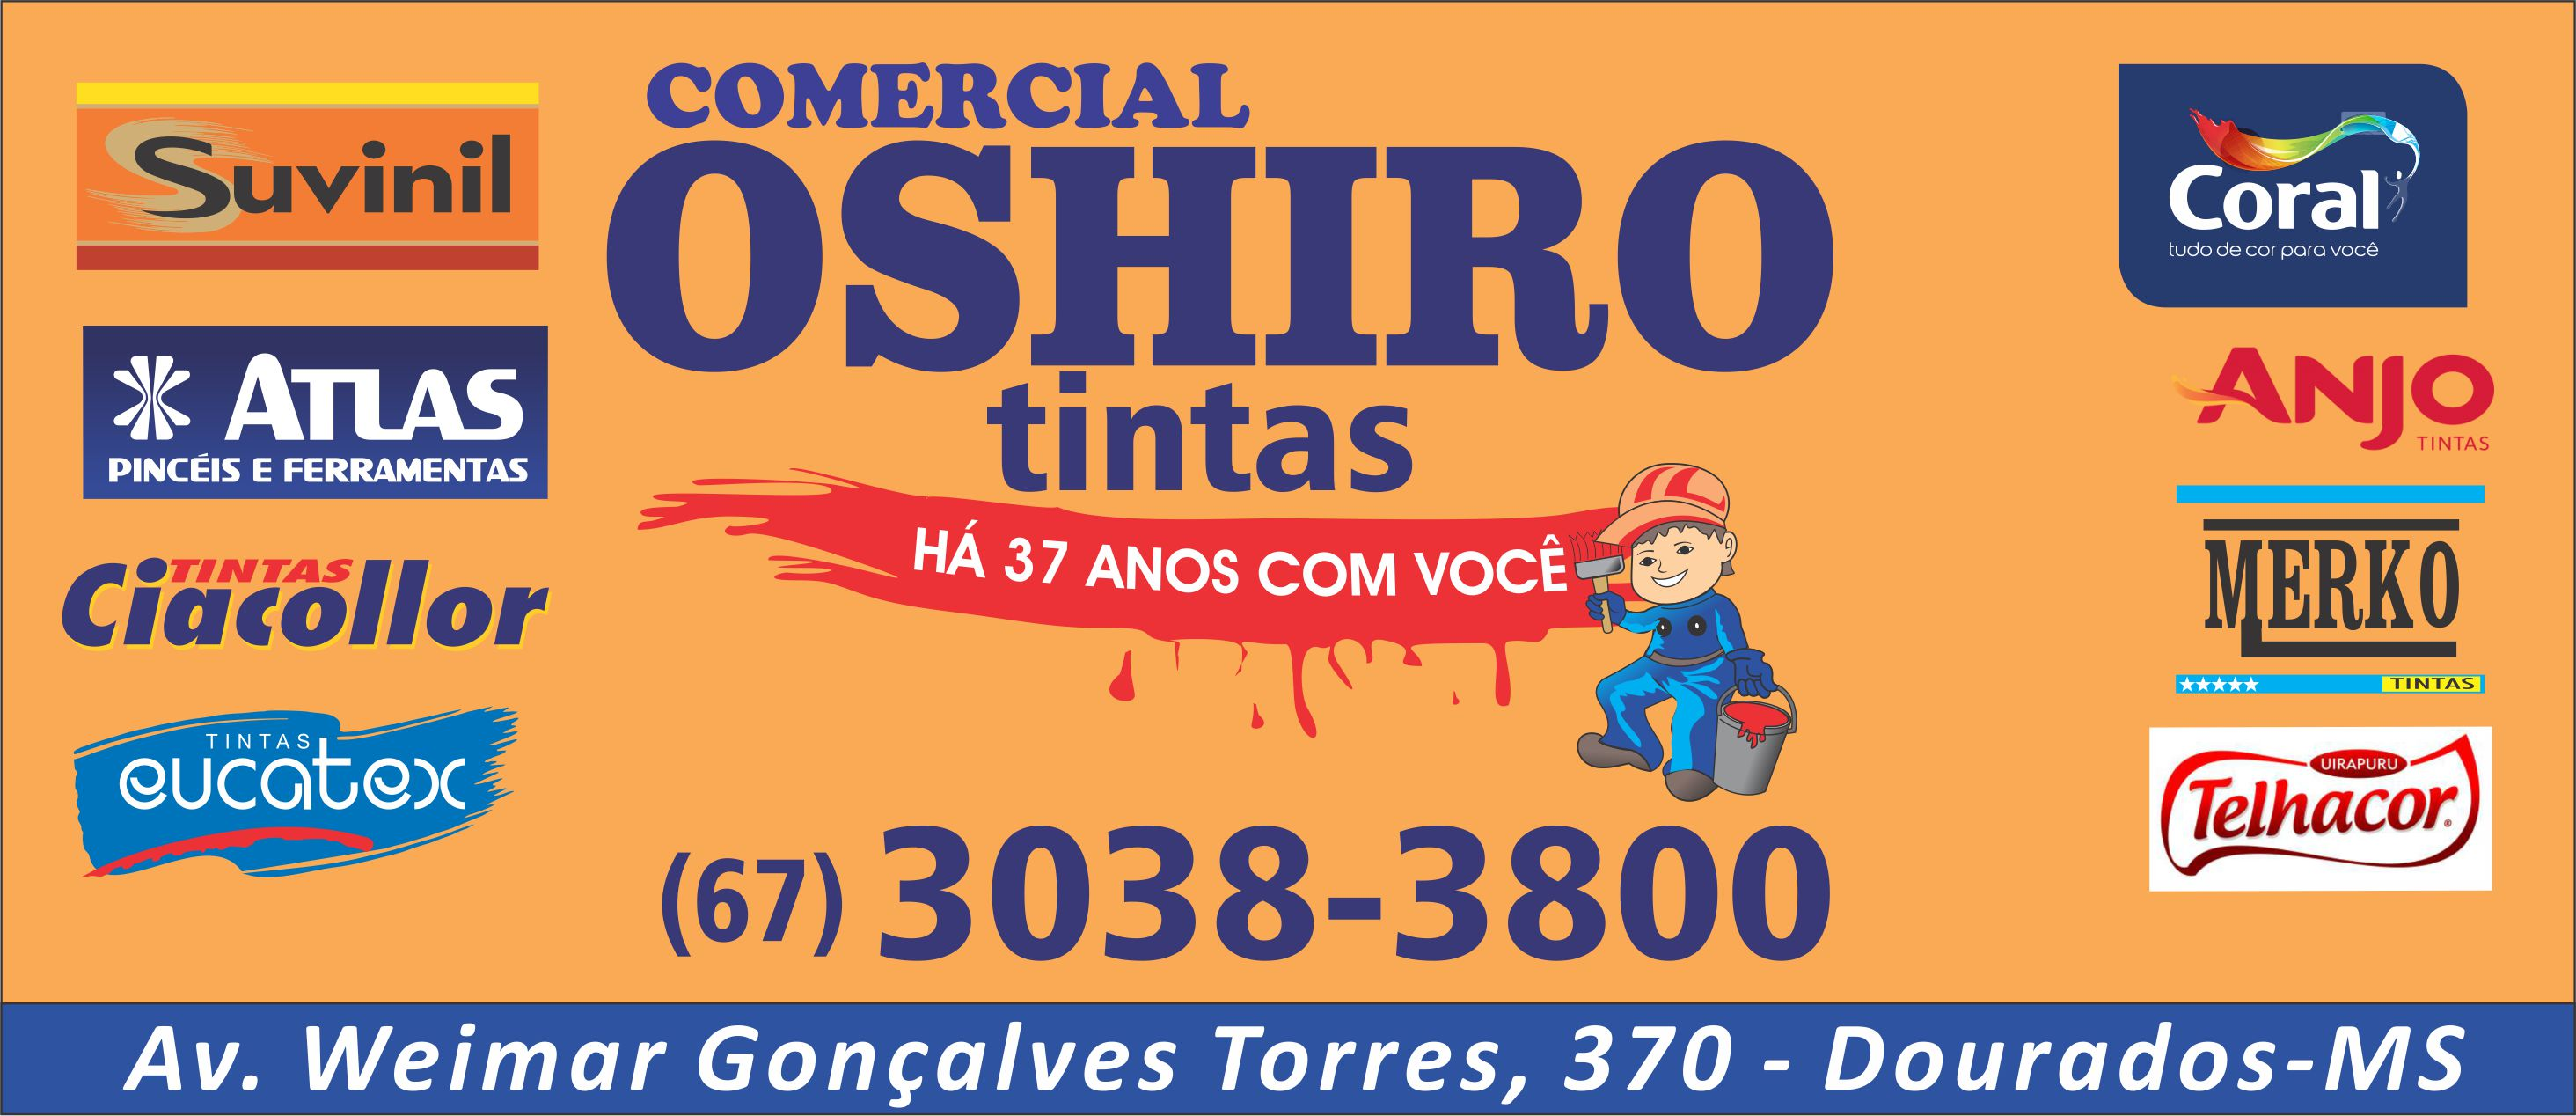 Comercial Oshiro